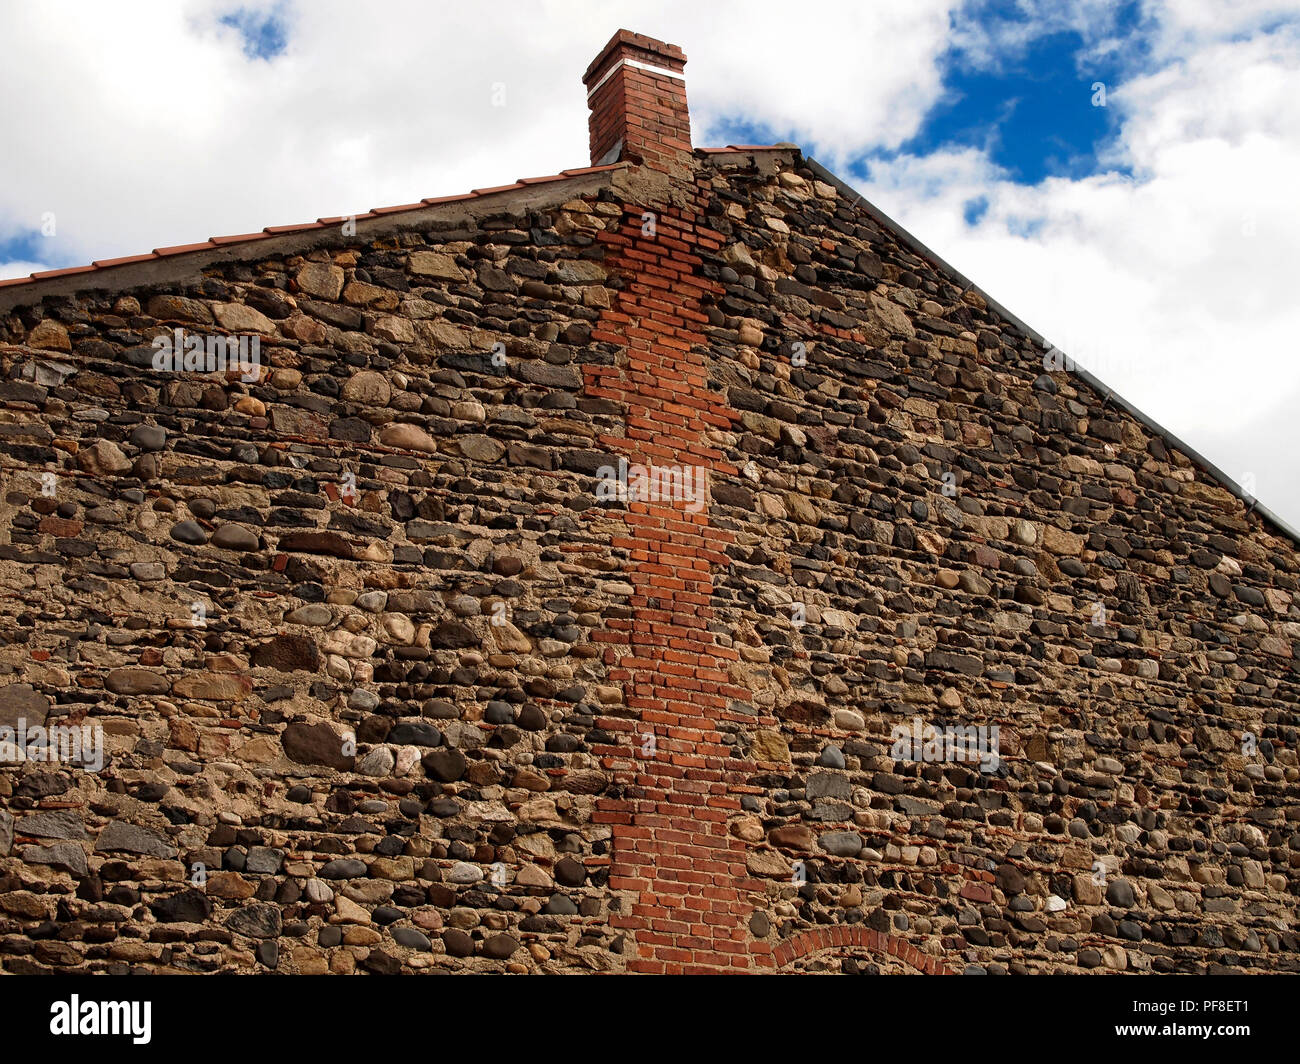 Exposed Brick Wall Stock Photos Amp Exposed Brick Wall Stock